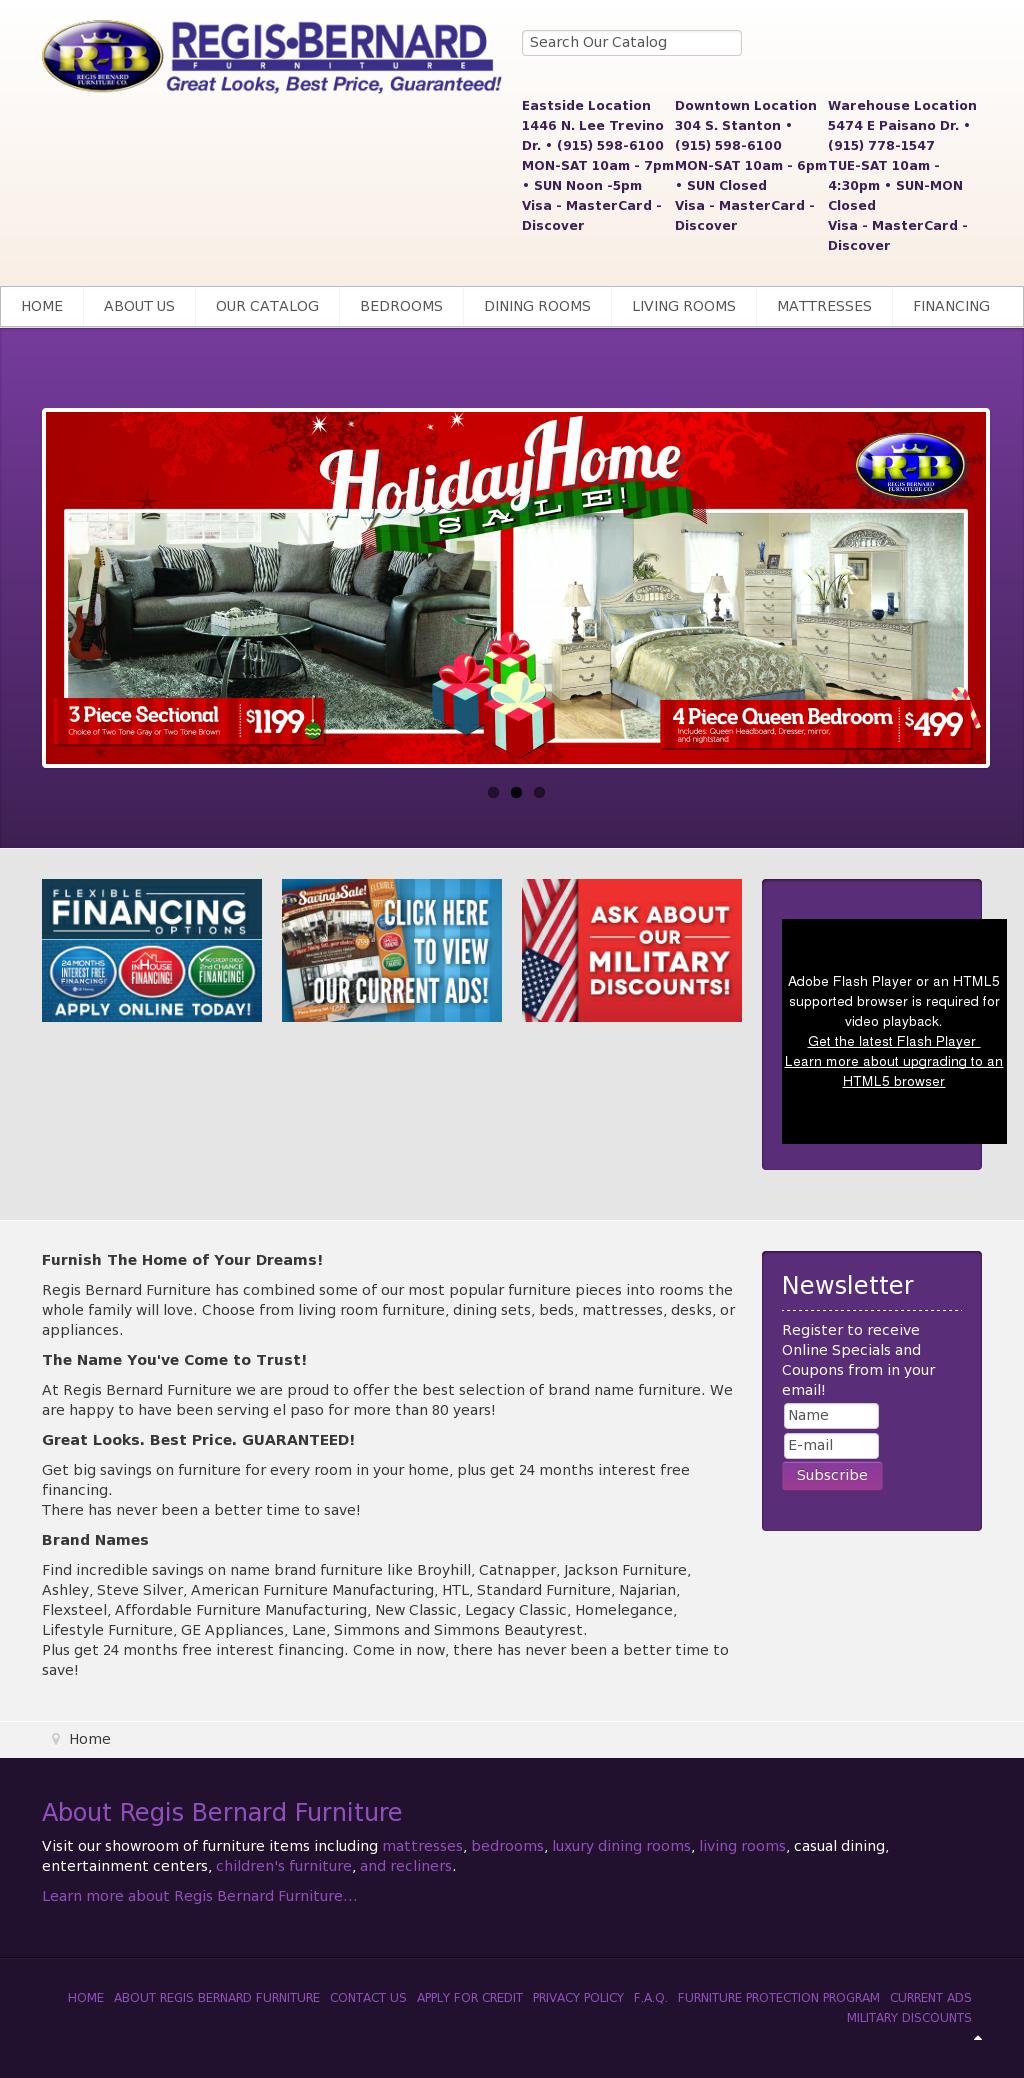 Attrayant Regis Bernard Furniture Competitors, Revenue And Employees   Owler Company  Profile